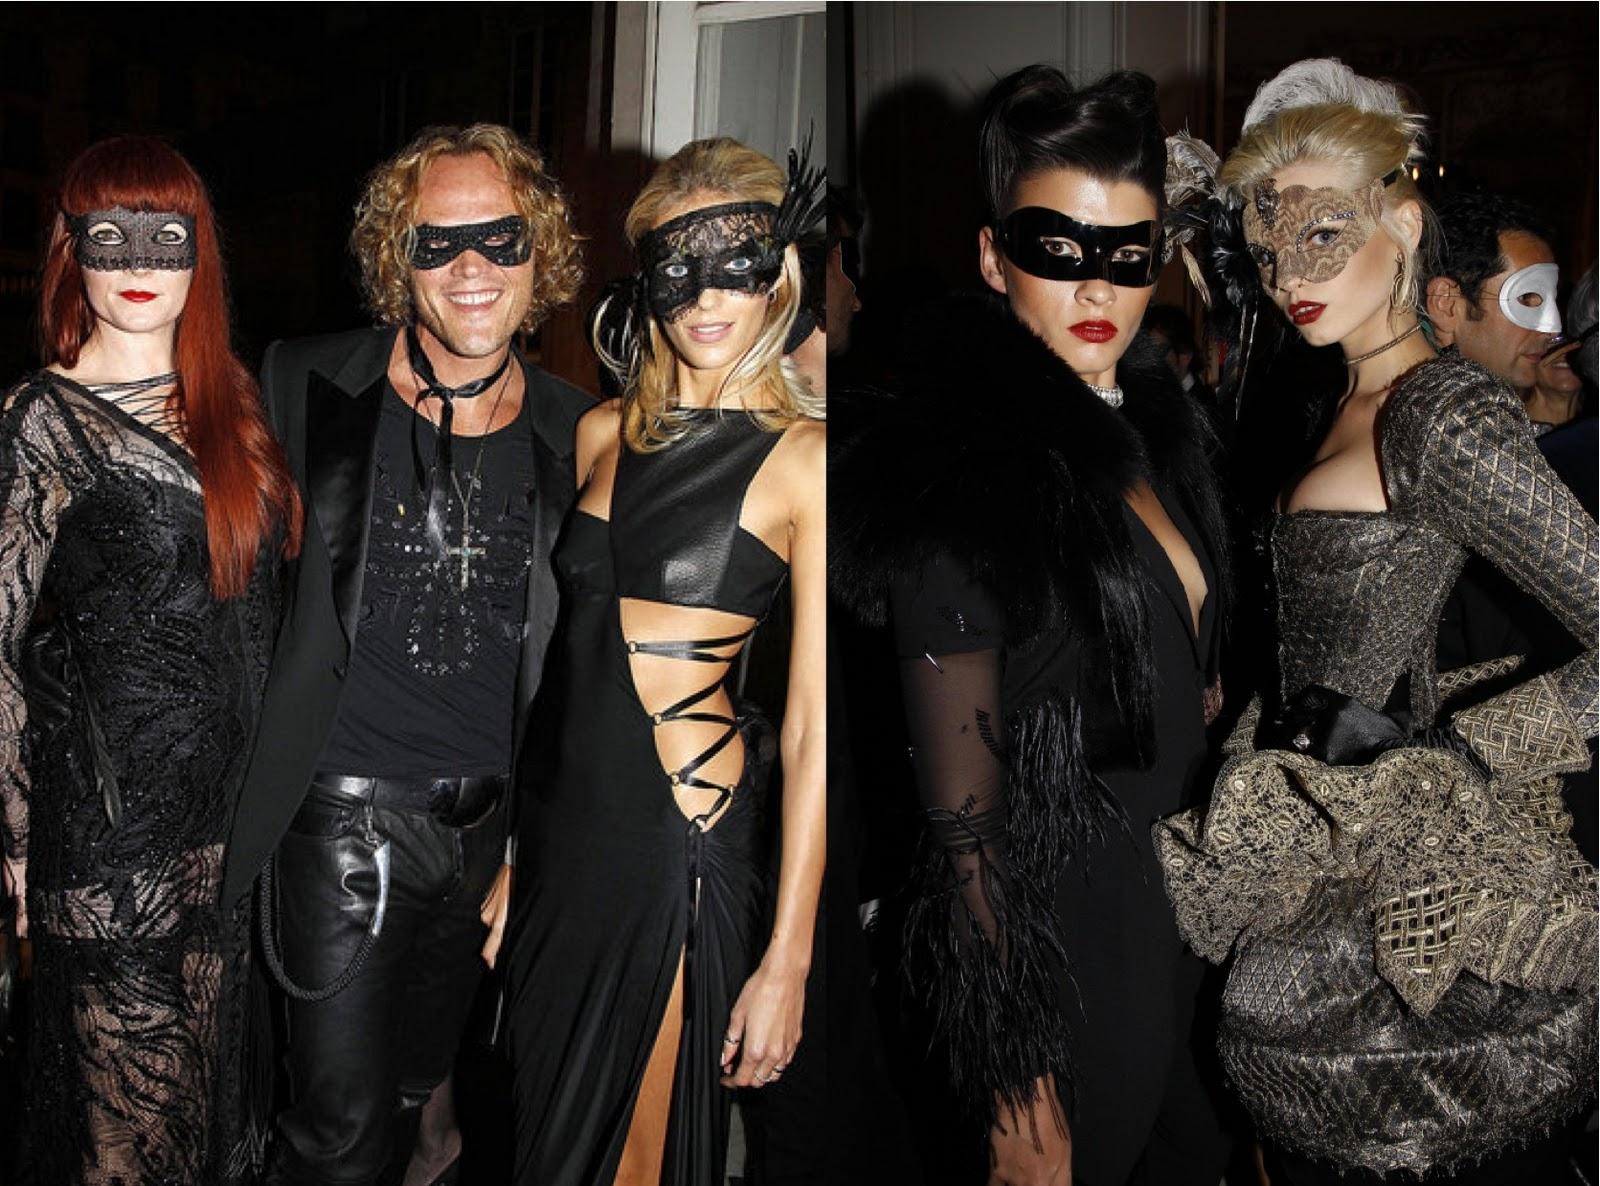 http://1.bp.blogspot.com/_PfmV3qvy8FY/TRzya7xk7LI/AAAAAAAAAs8/UqGYLBLzKU8/s1600/la+modella+mafia+Vogue+Masquerade+Ball+Peter+Dundas%252C+Anja+Rubik+%2526+Abbey+Lee+Kershaw.jpg